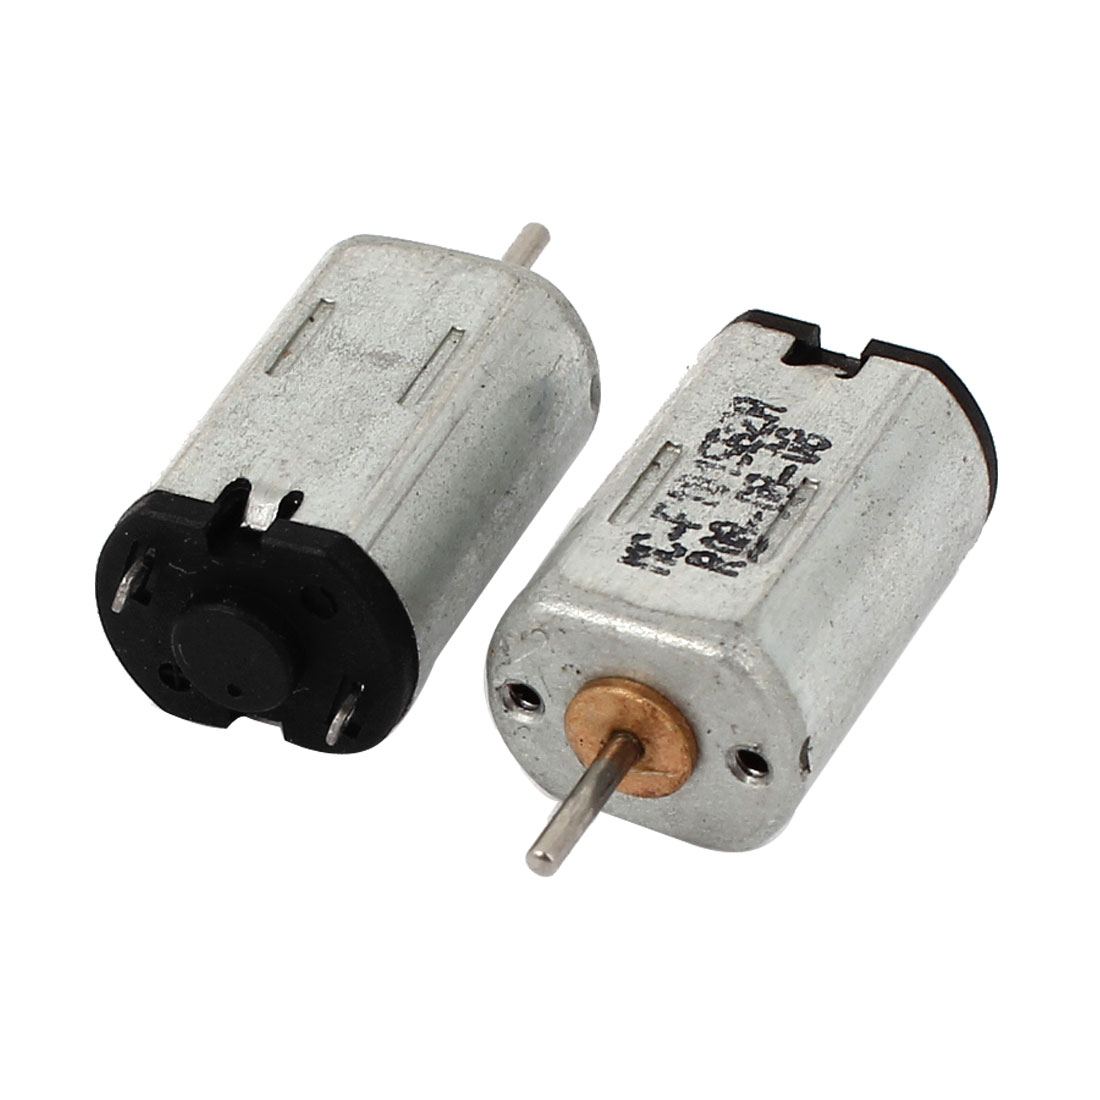 2pcs DC 1.5-6V 21500RPM 1x6mm Shaft Mini Motor for Car Model Toys DIY